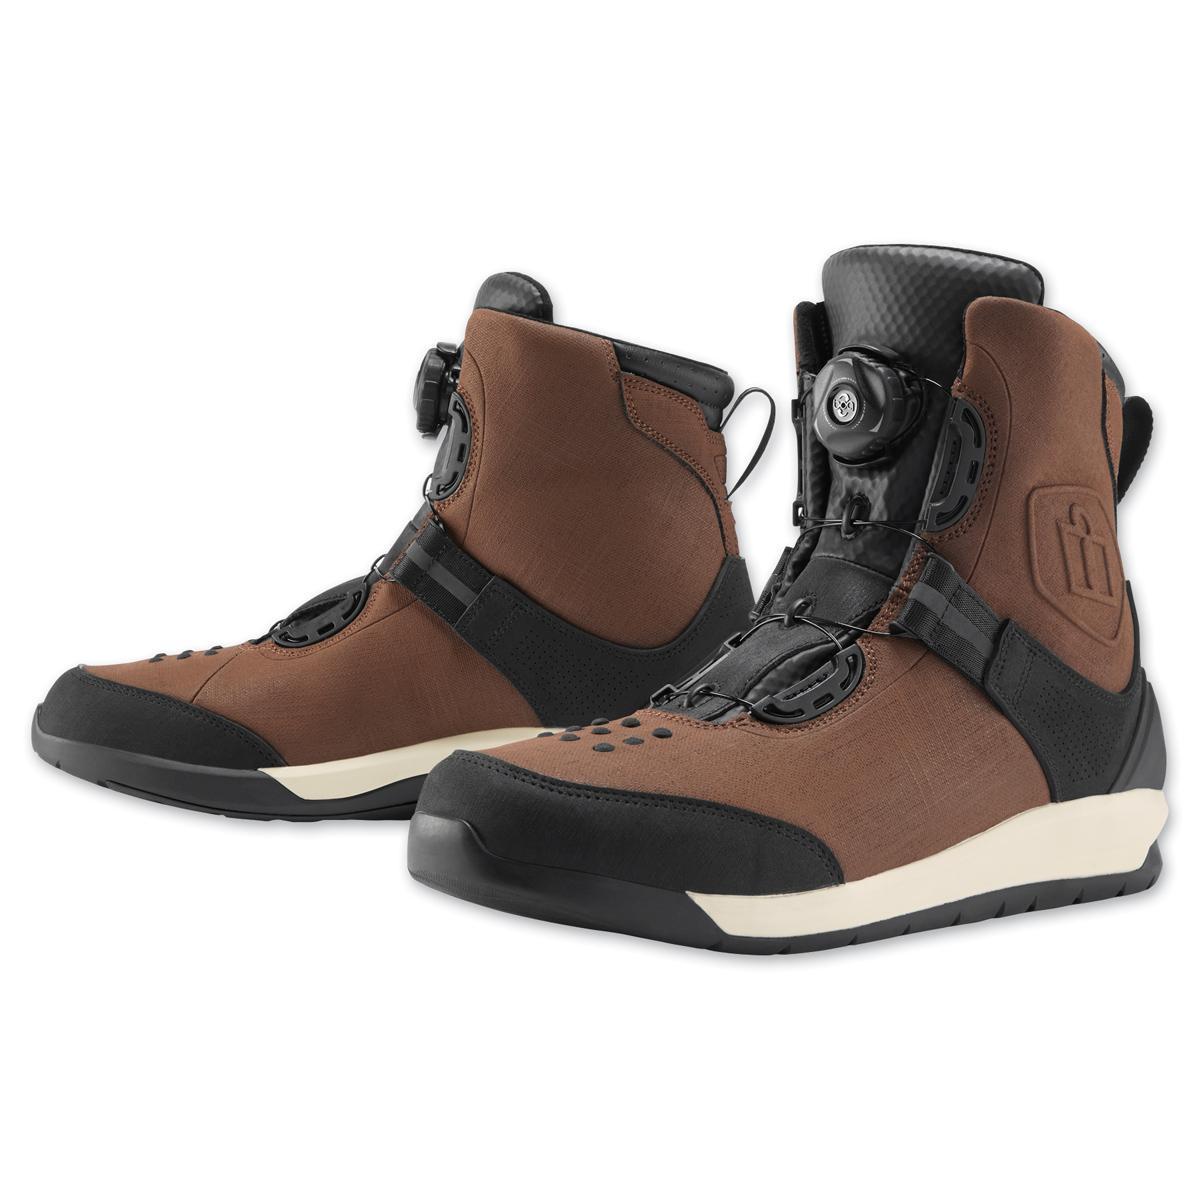 ICON Men's Patrol 2 Brown Boots